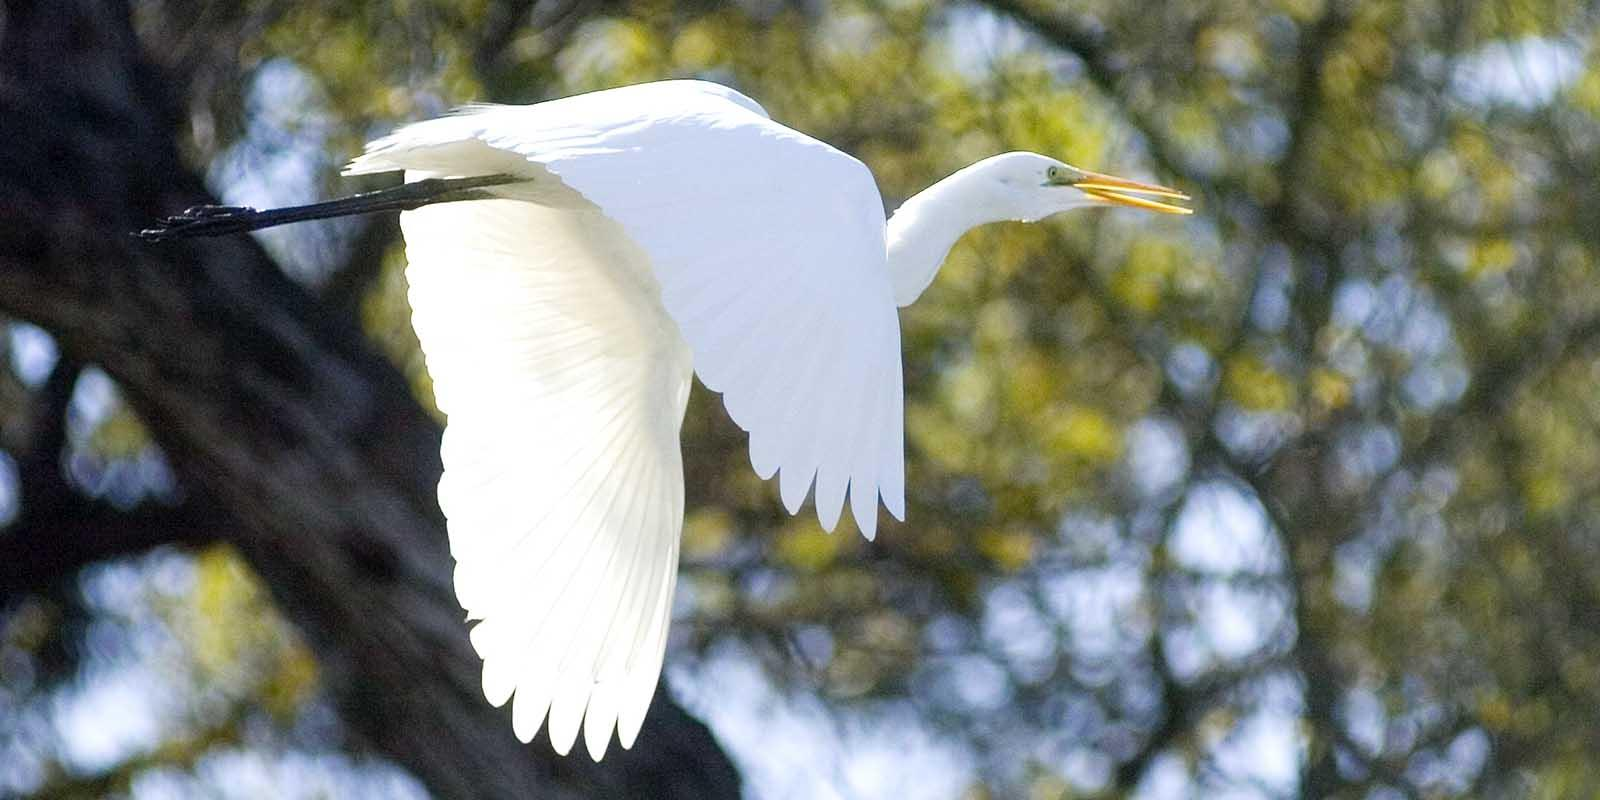 A cattle egret makes a springtime visit at the Lyle Center